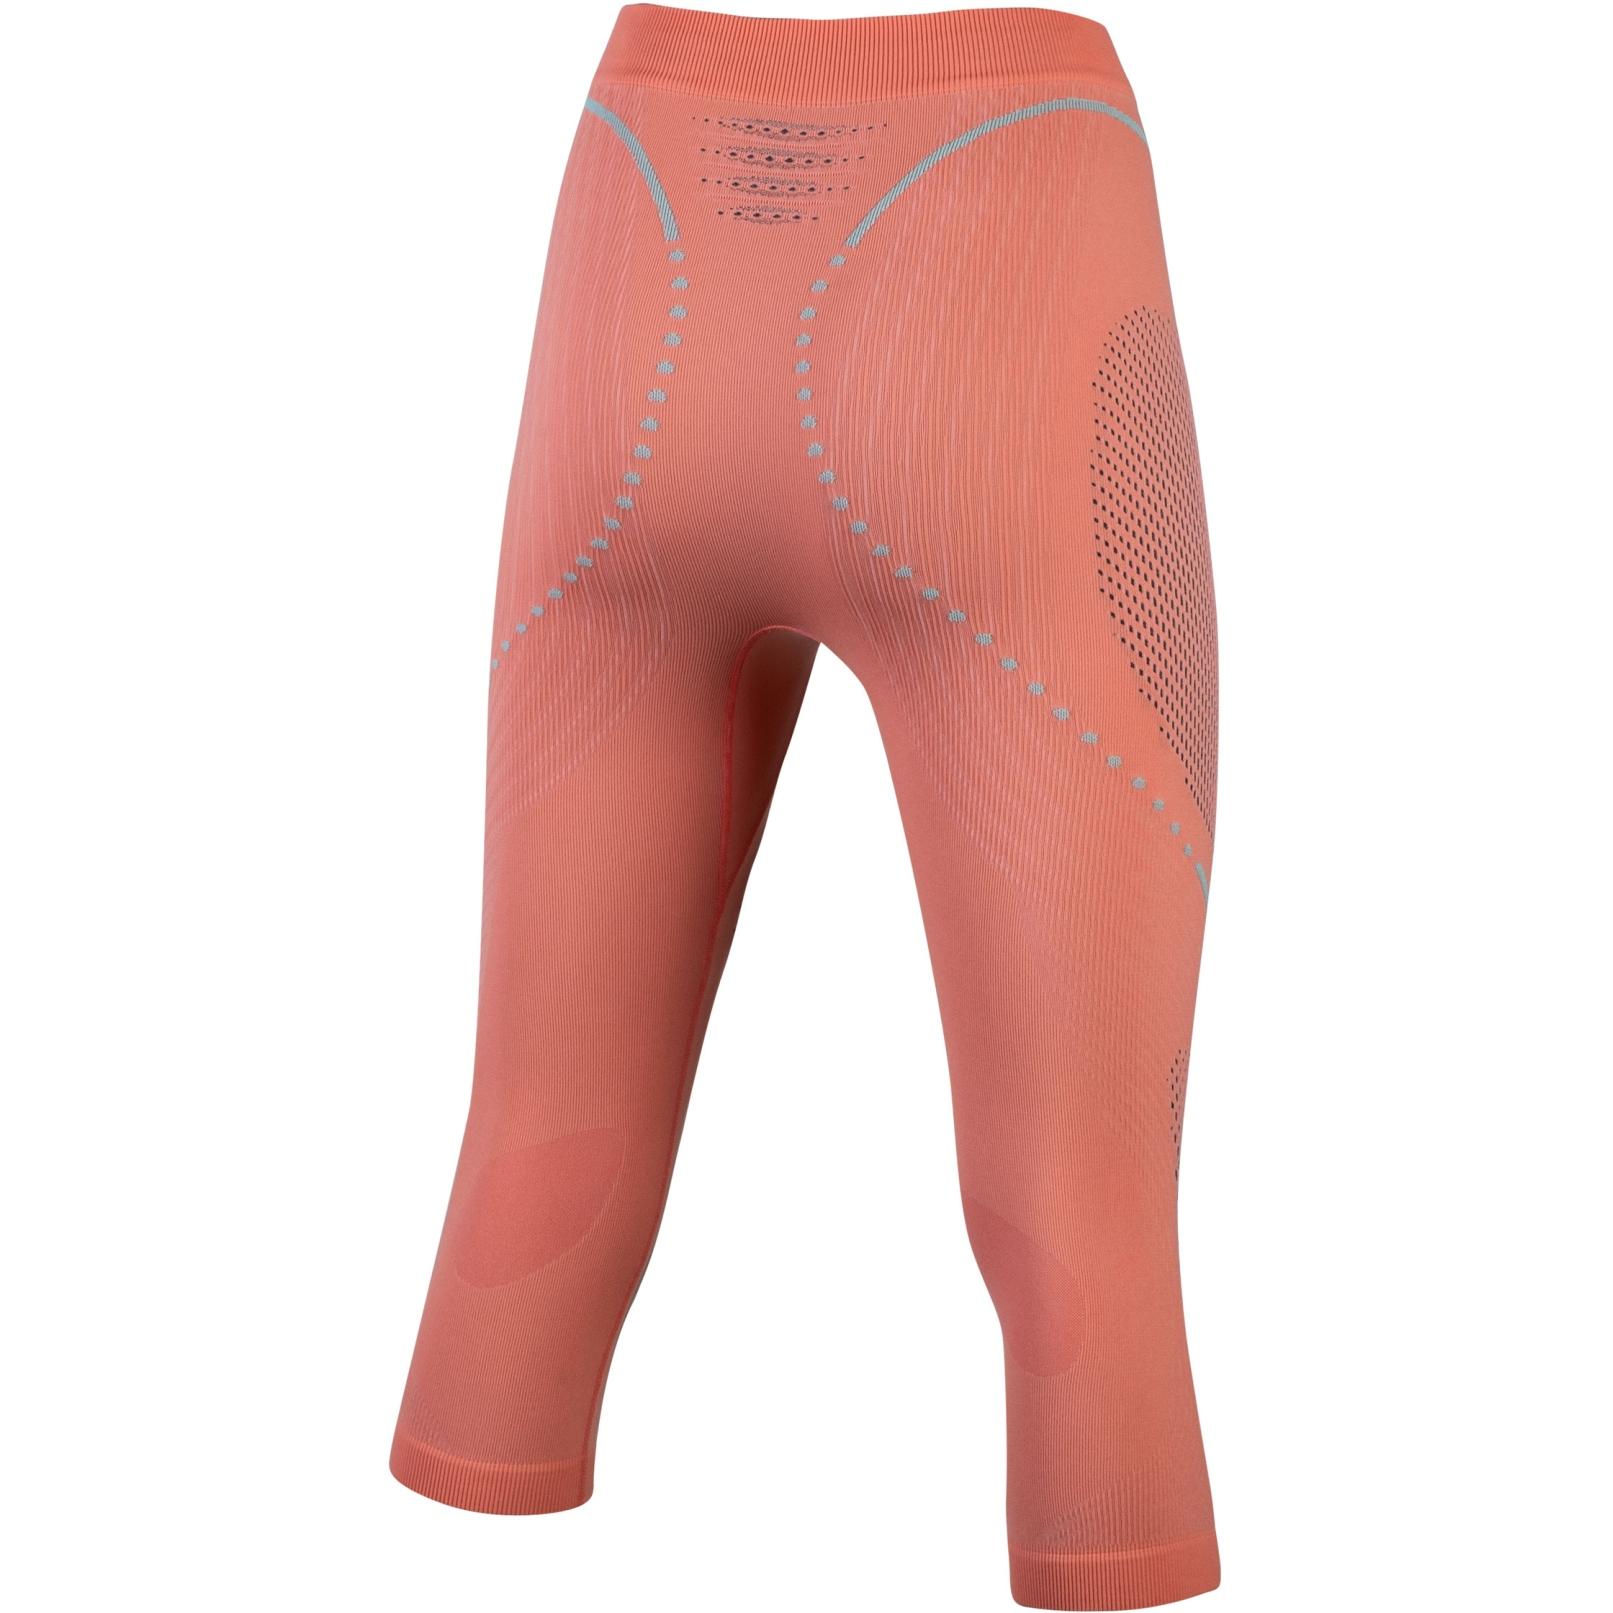 Image of UYN Evolutyon Underwear Pants Medium Women - Coral/Anthracite/Aqua